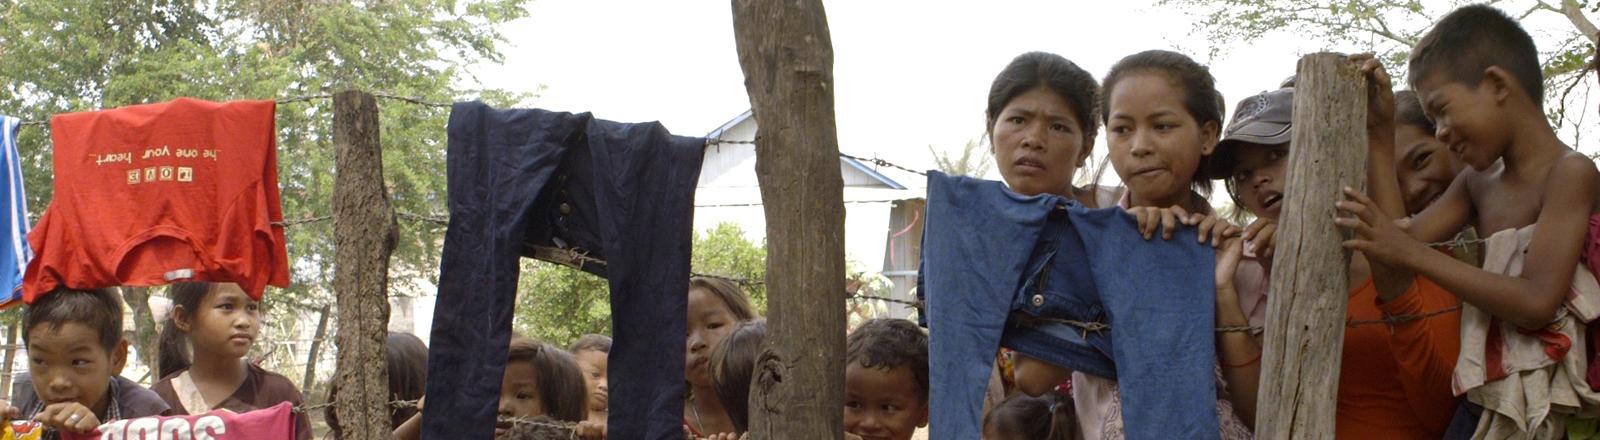 Kinder hinter einem Zaun, an dem Kleidungsstücke hängen.